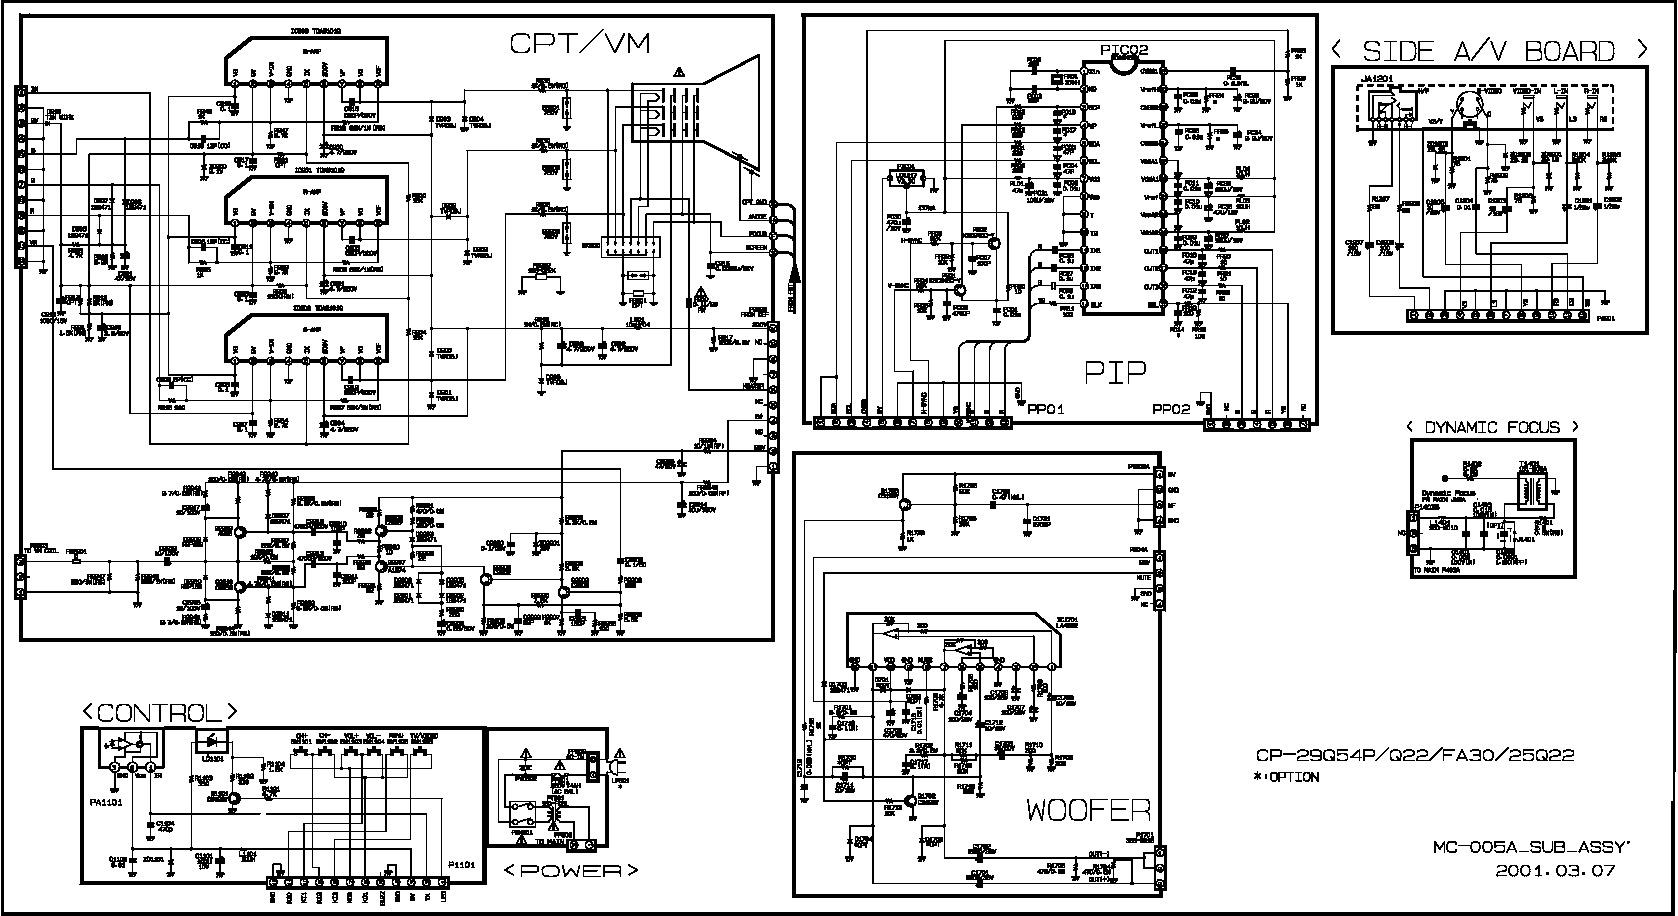 q54psub[1].plt.pdf